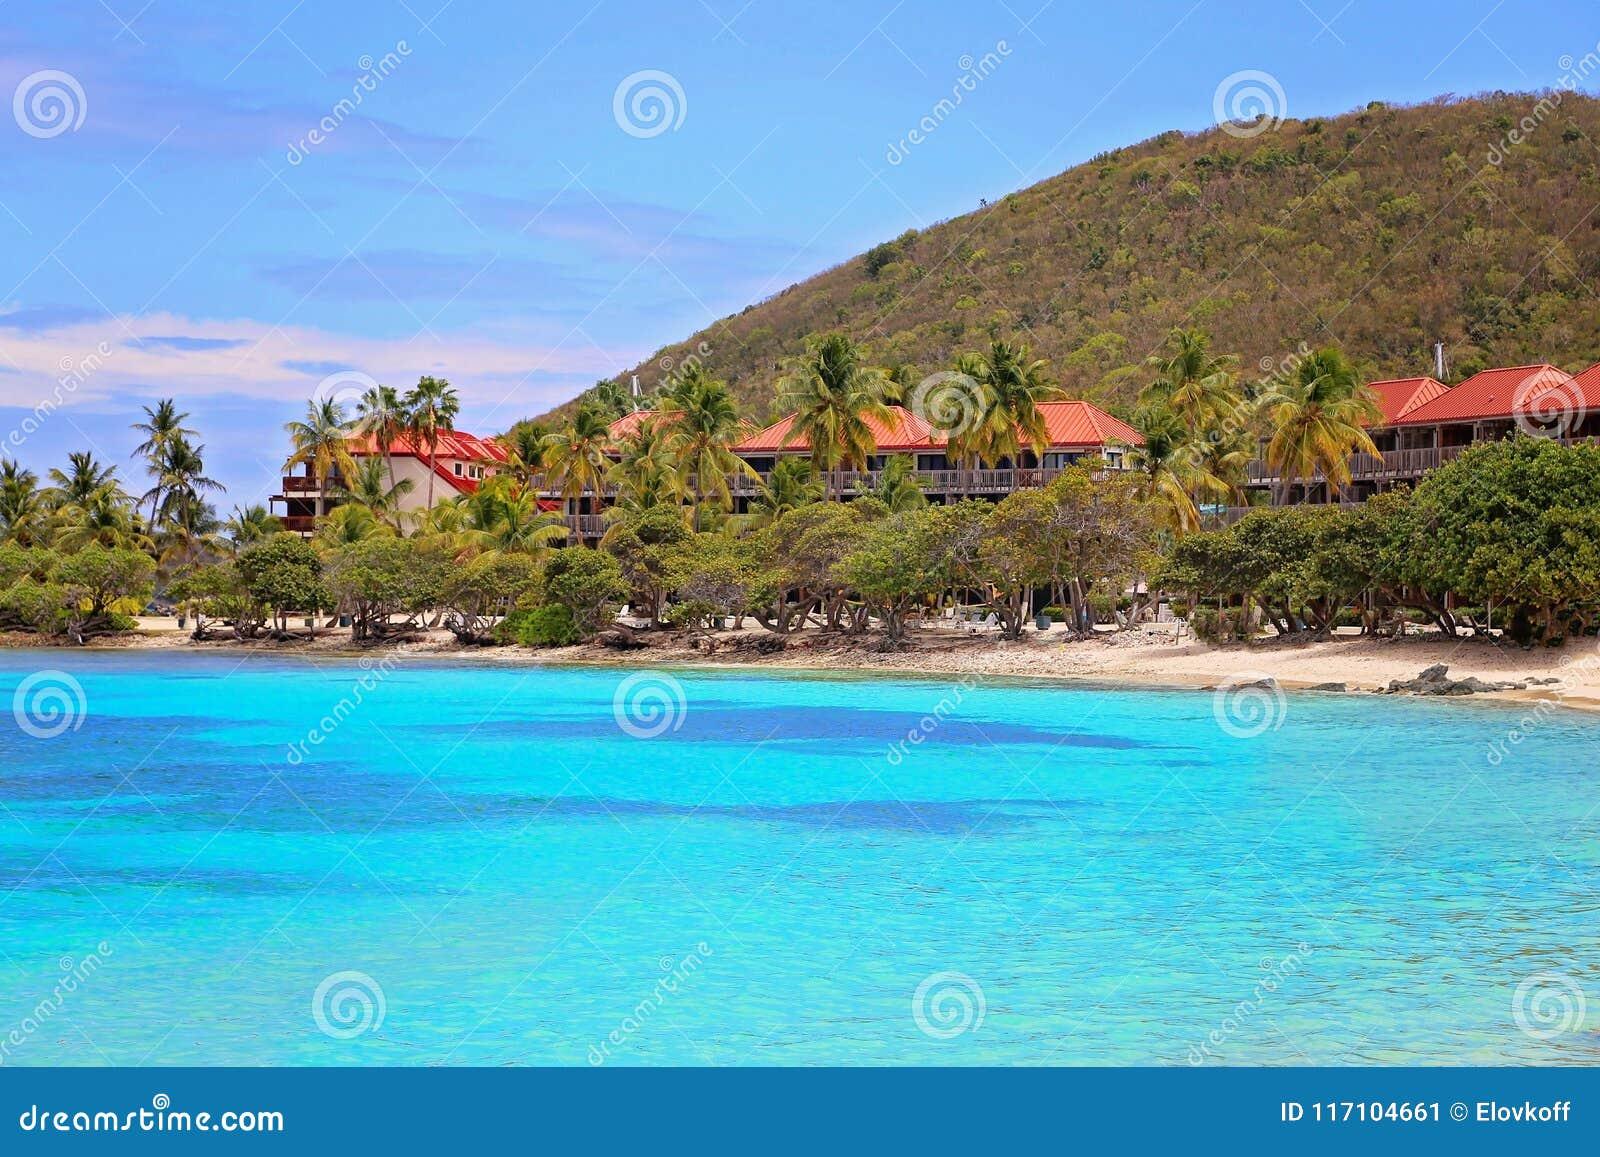 sapphire beach on st thomas island stock image image of sapphire